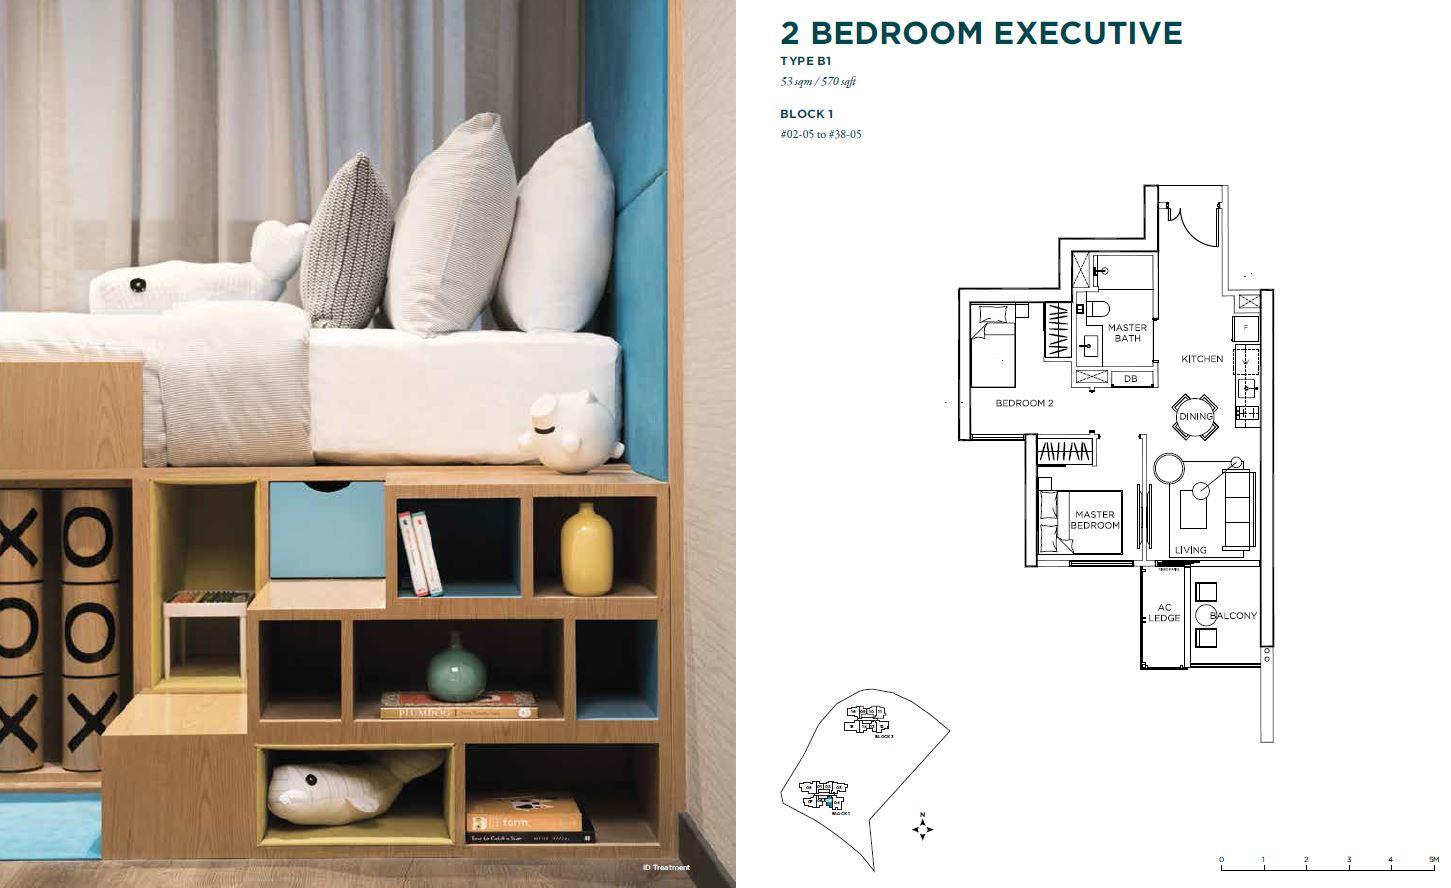 Gem Residences 2 bedroom executive